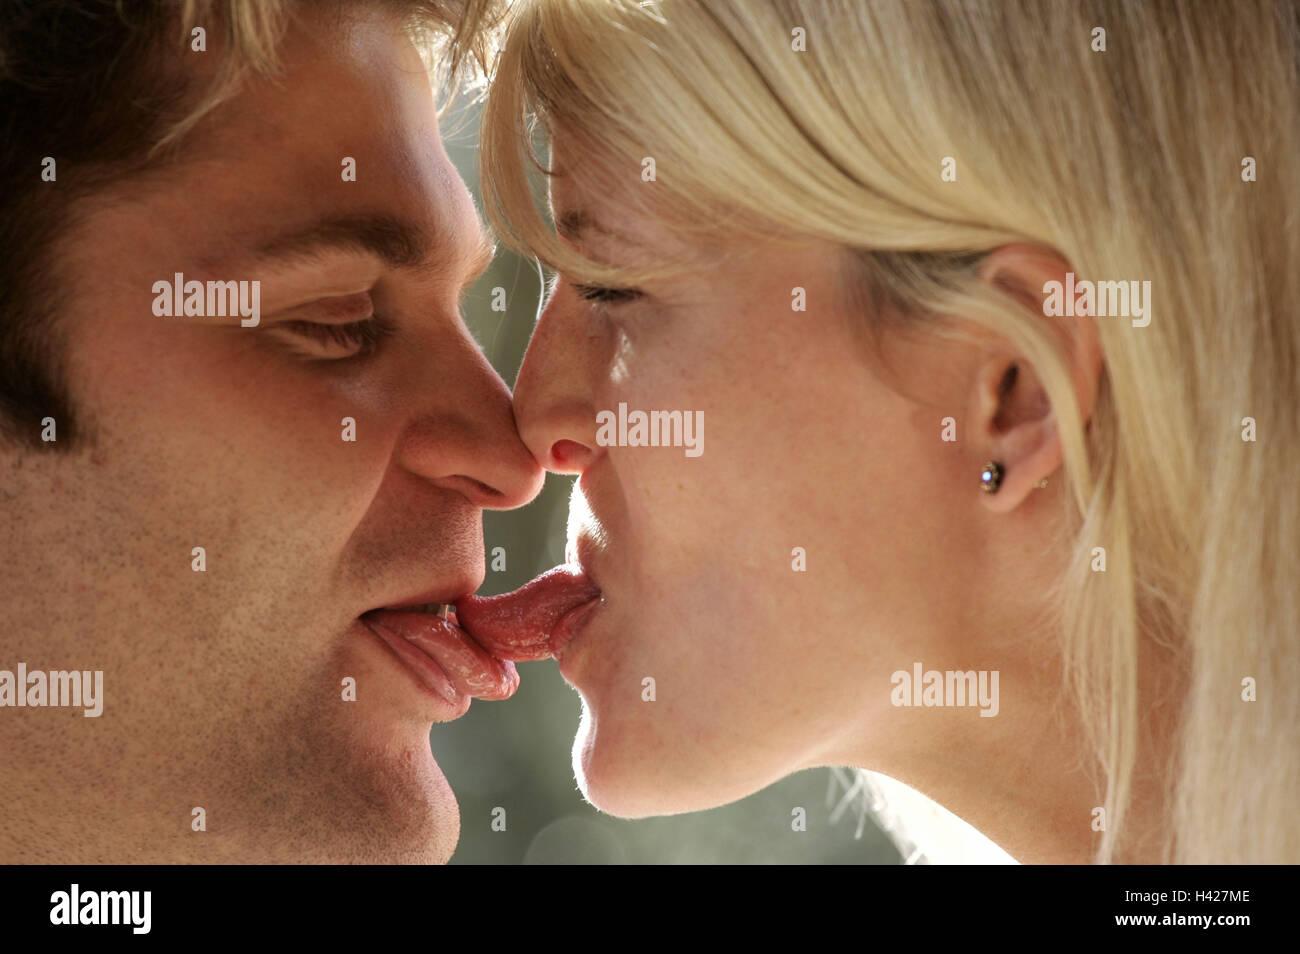 Toung to toung kiss